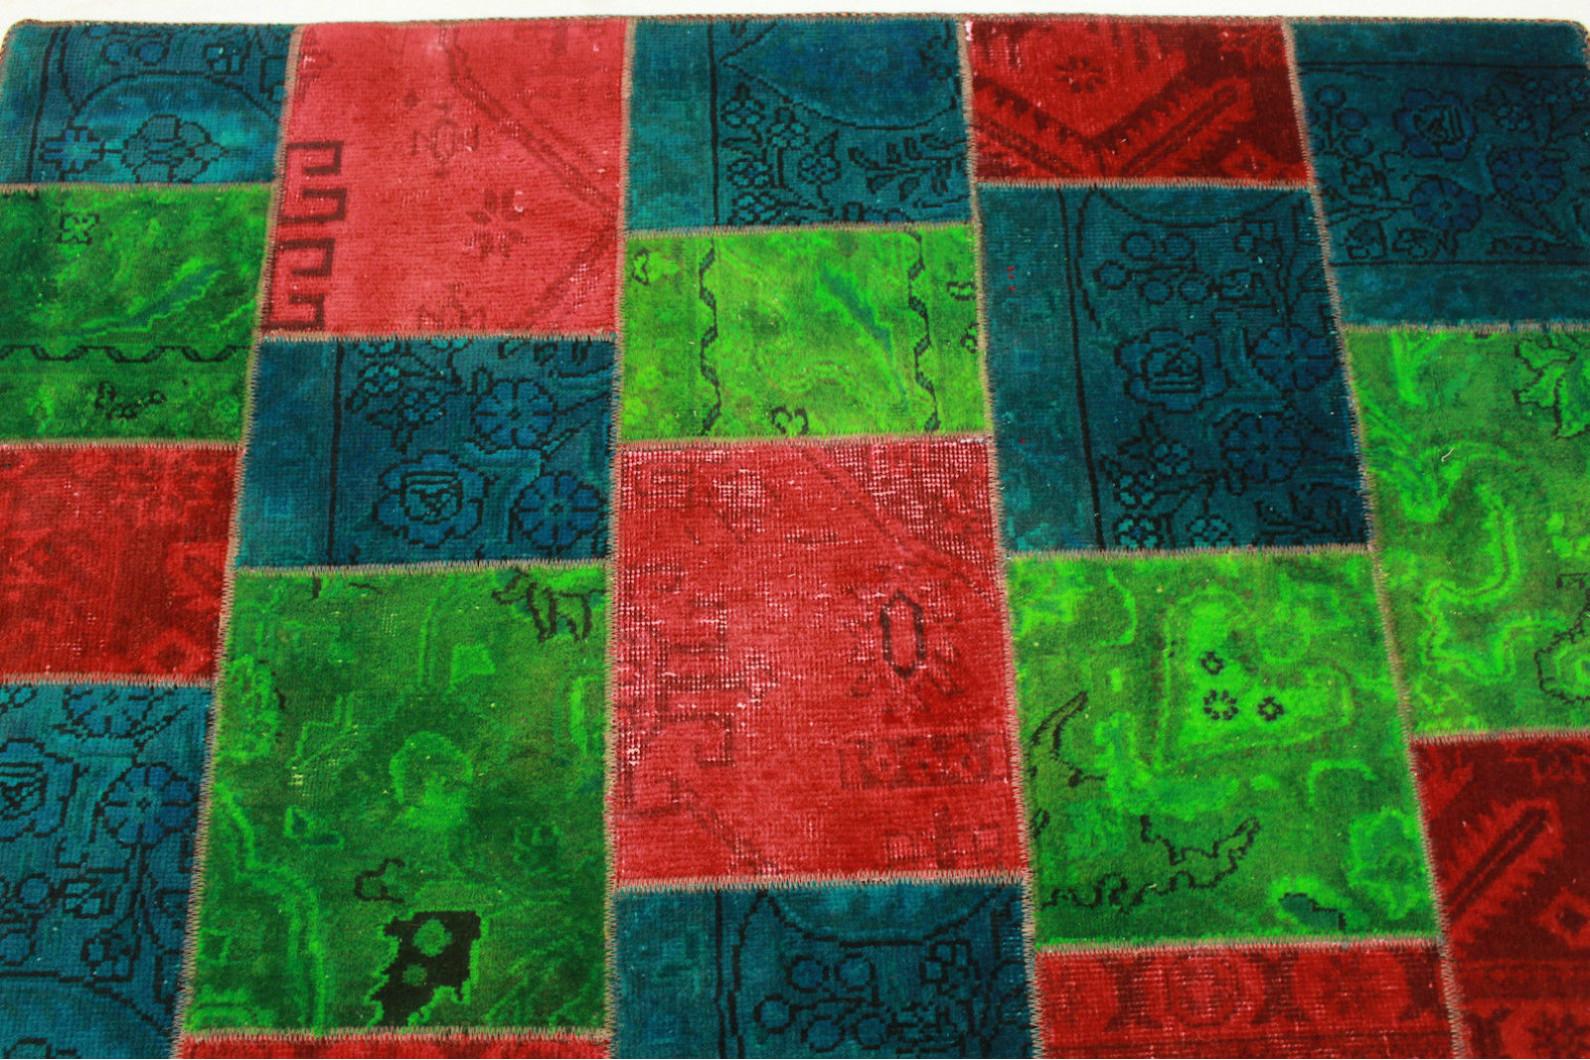 patchwork teppich gr n rot blau in 200x150cm 1001 2531. Black Bedroom Furniture Sets. Home Design Ideas